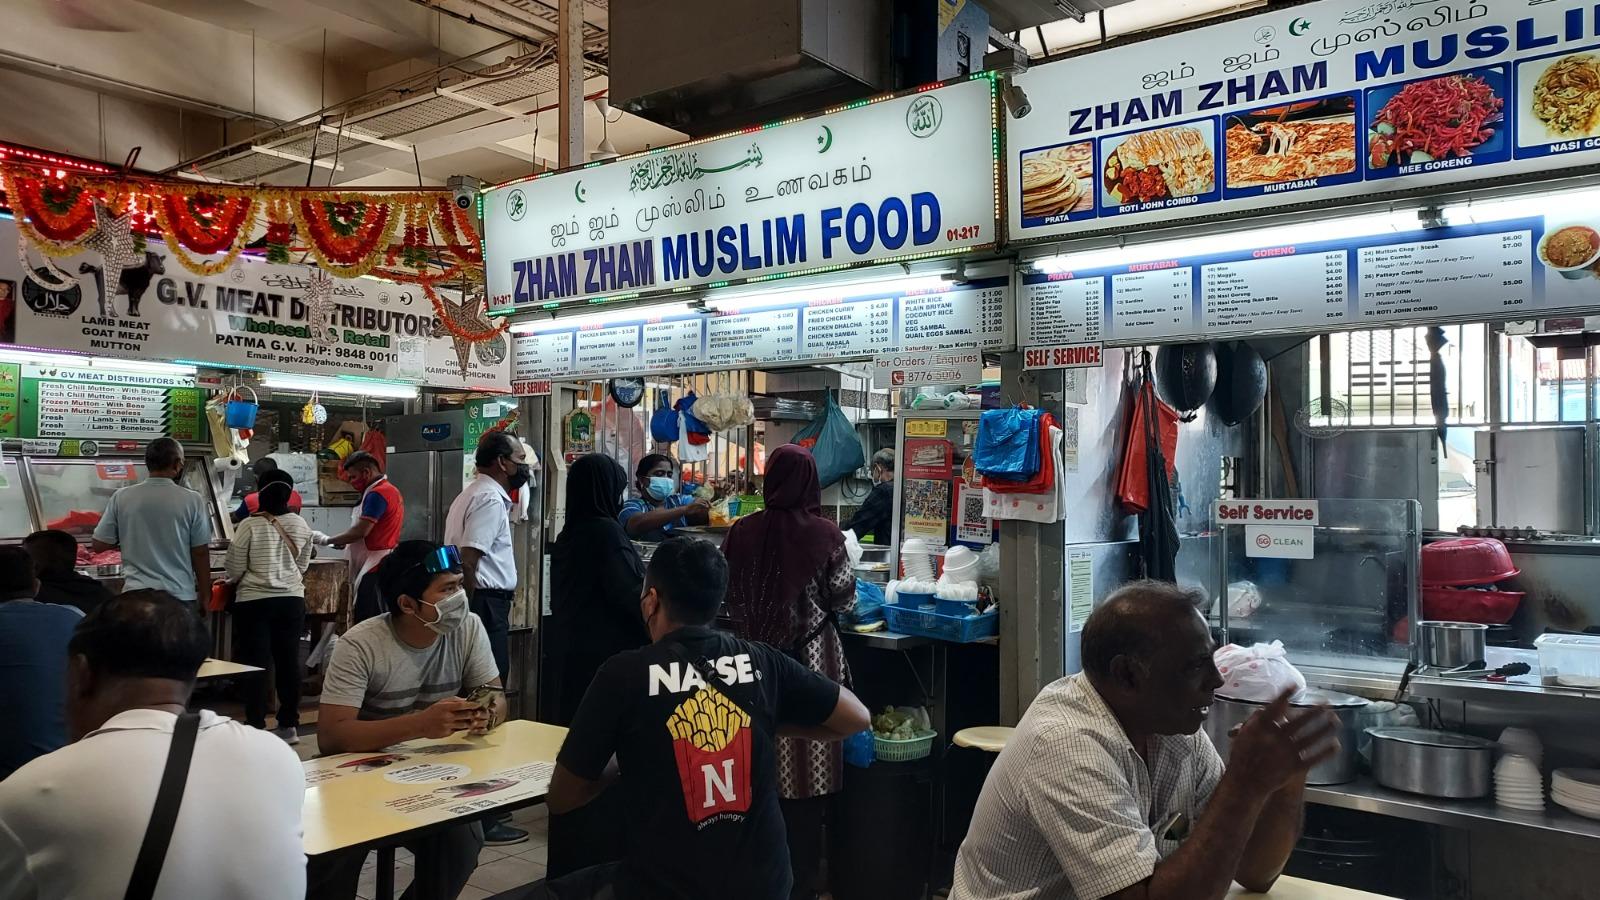 Zham Zham Muslim Food at Tekka Centre. Photo courtesy: Fanzura Banu